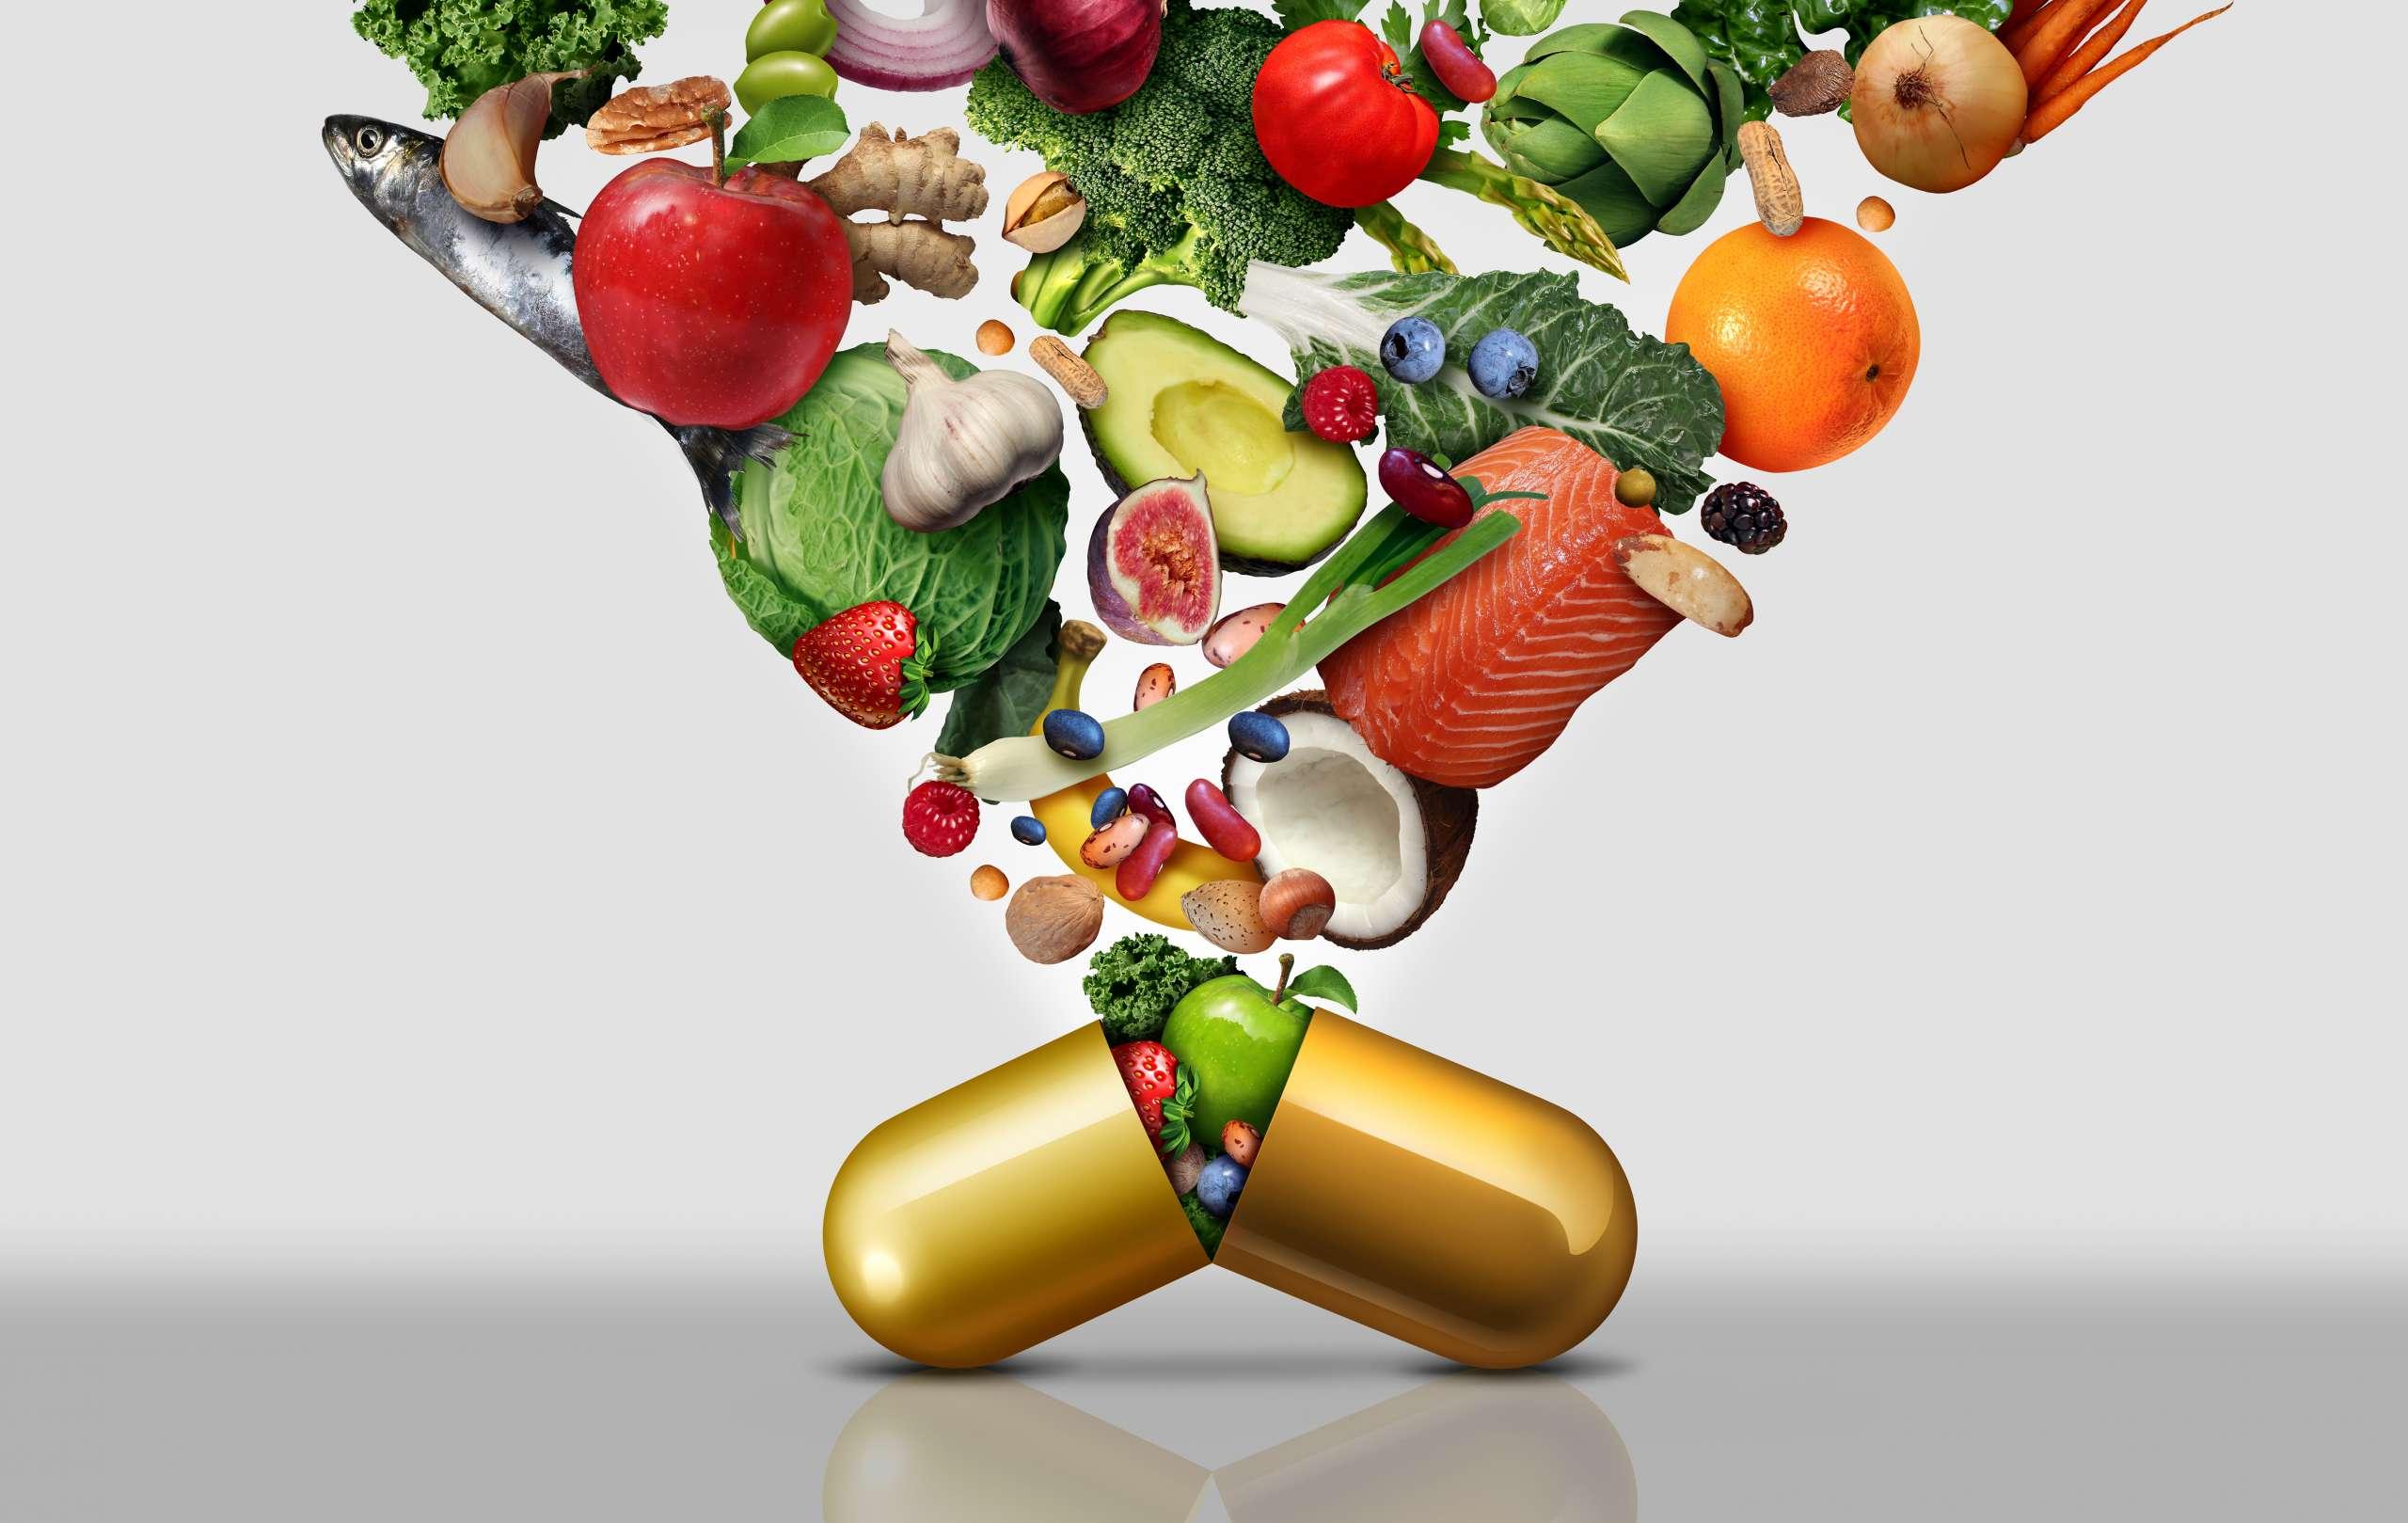 Prävention durch Nahrungsergänzung